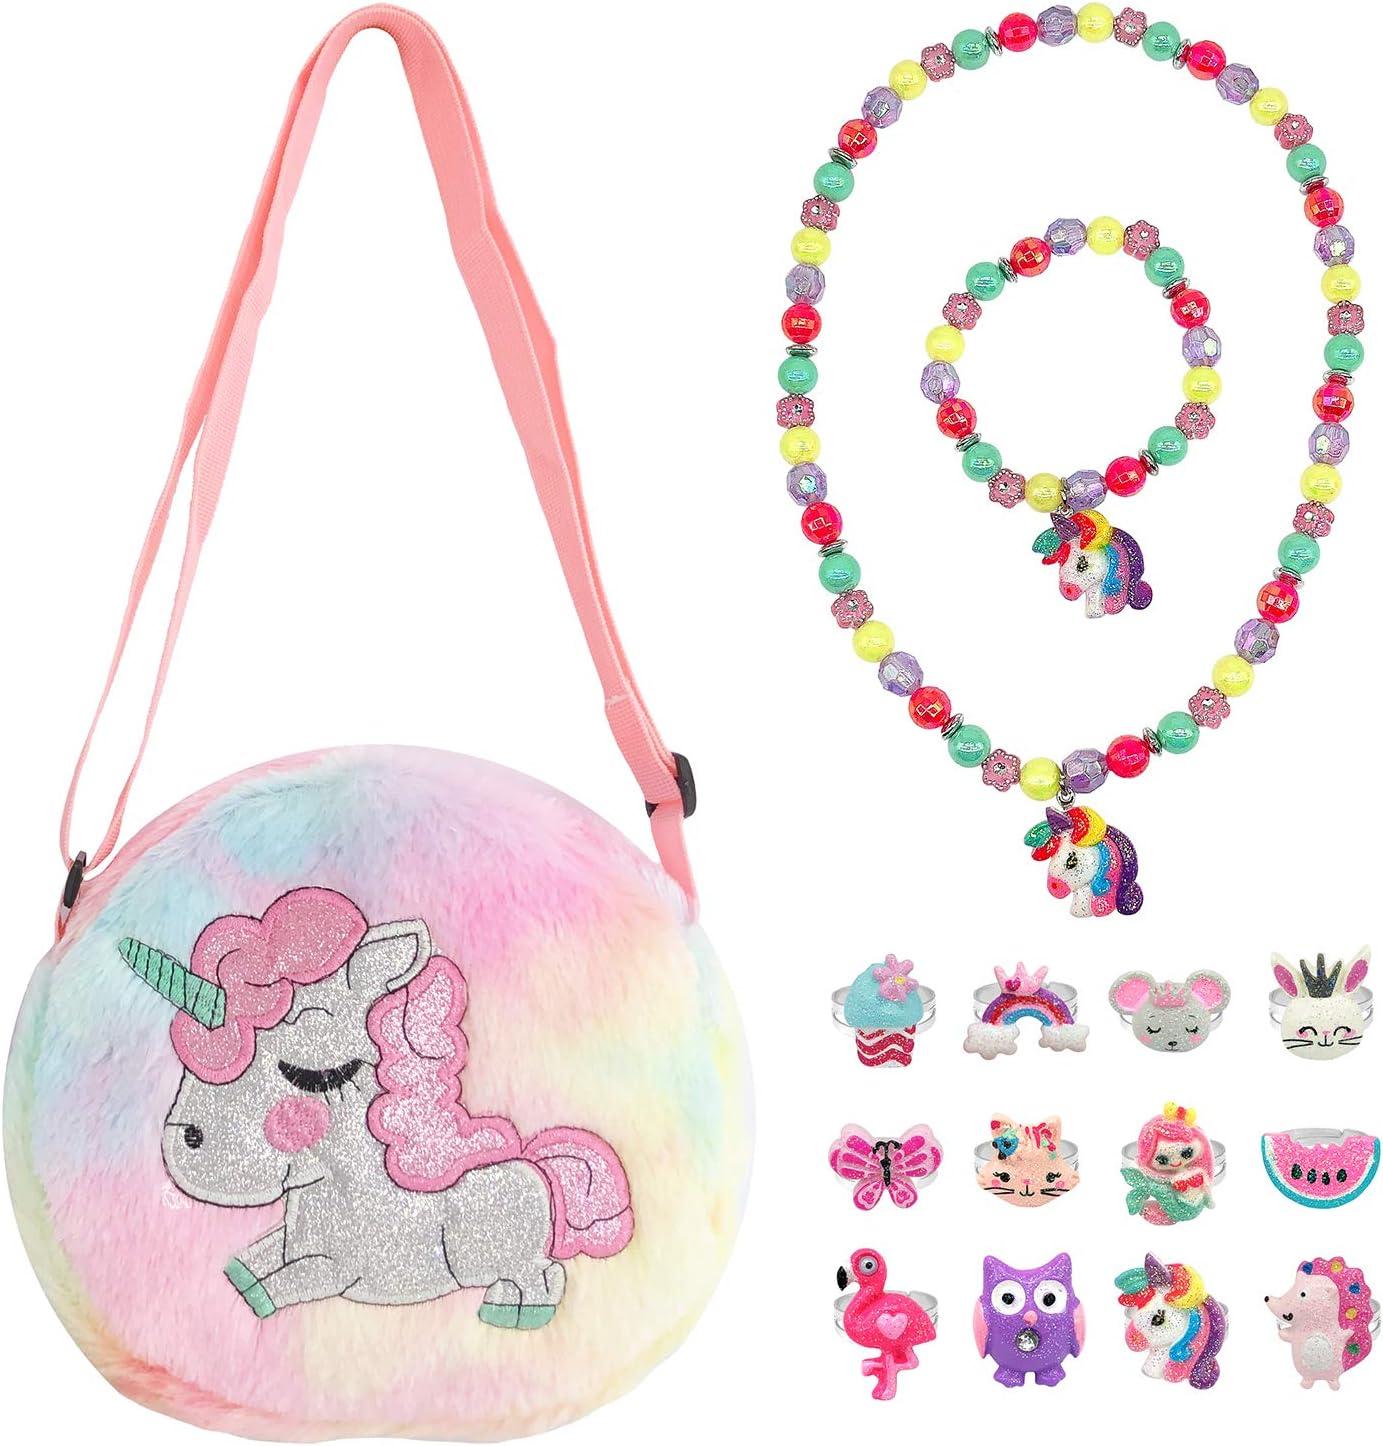 Elesa Miracle Little Girl Plush Purse Handbag Kids Necklace Pret